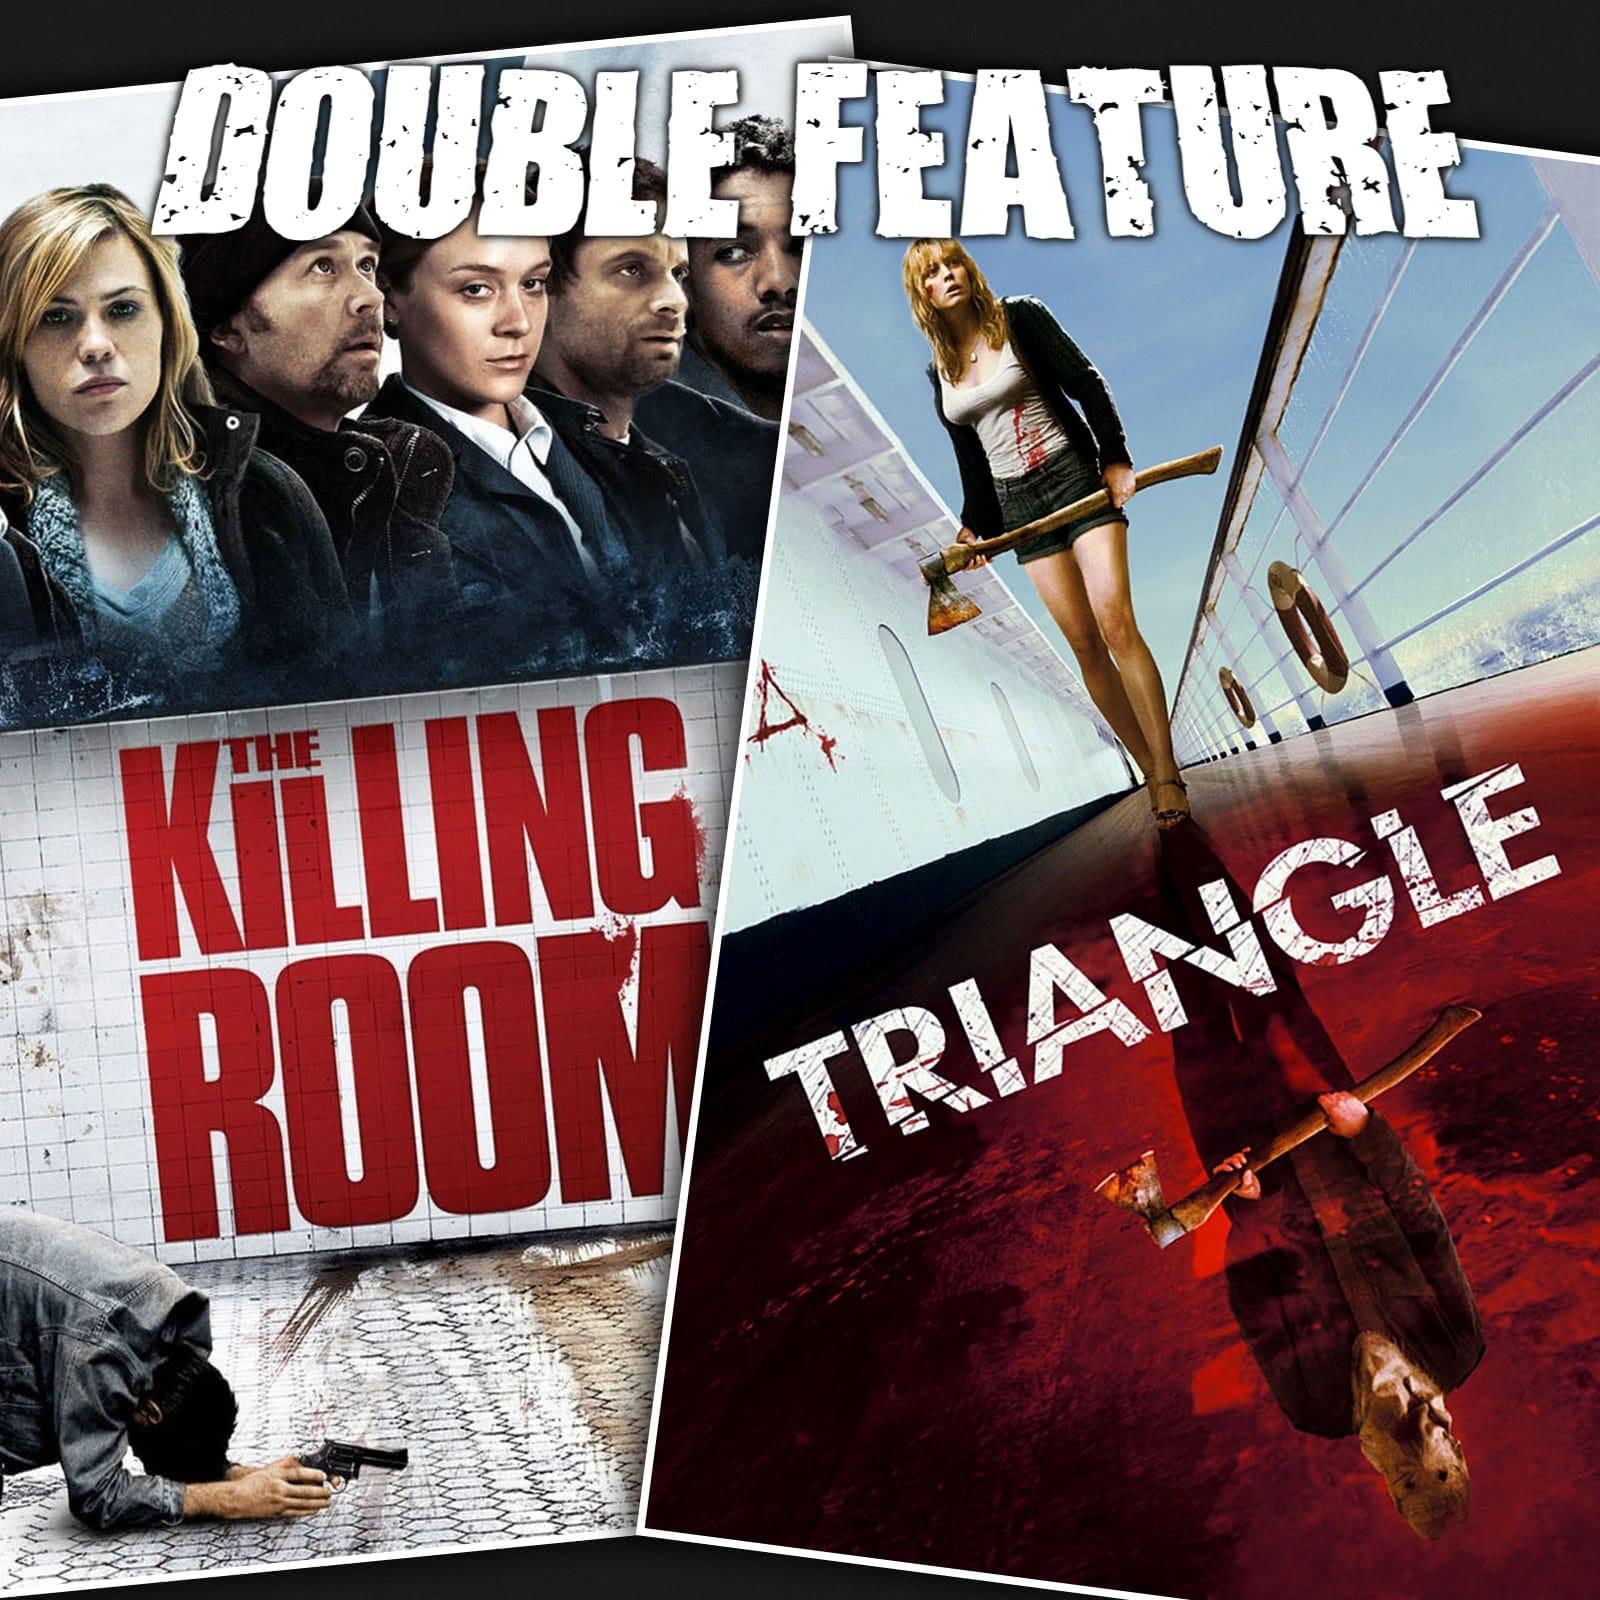 The Killing Room Triangle